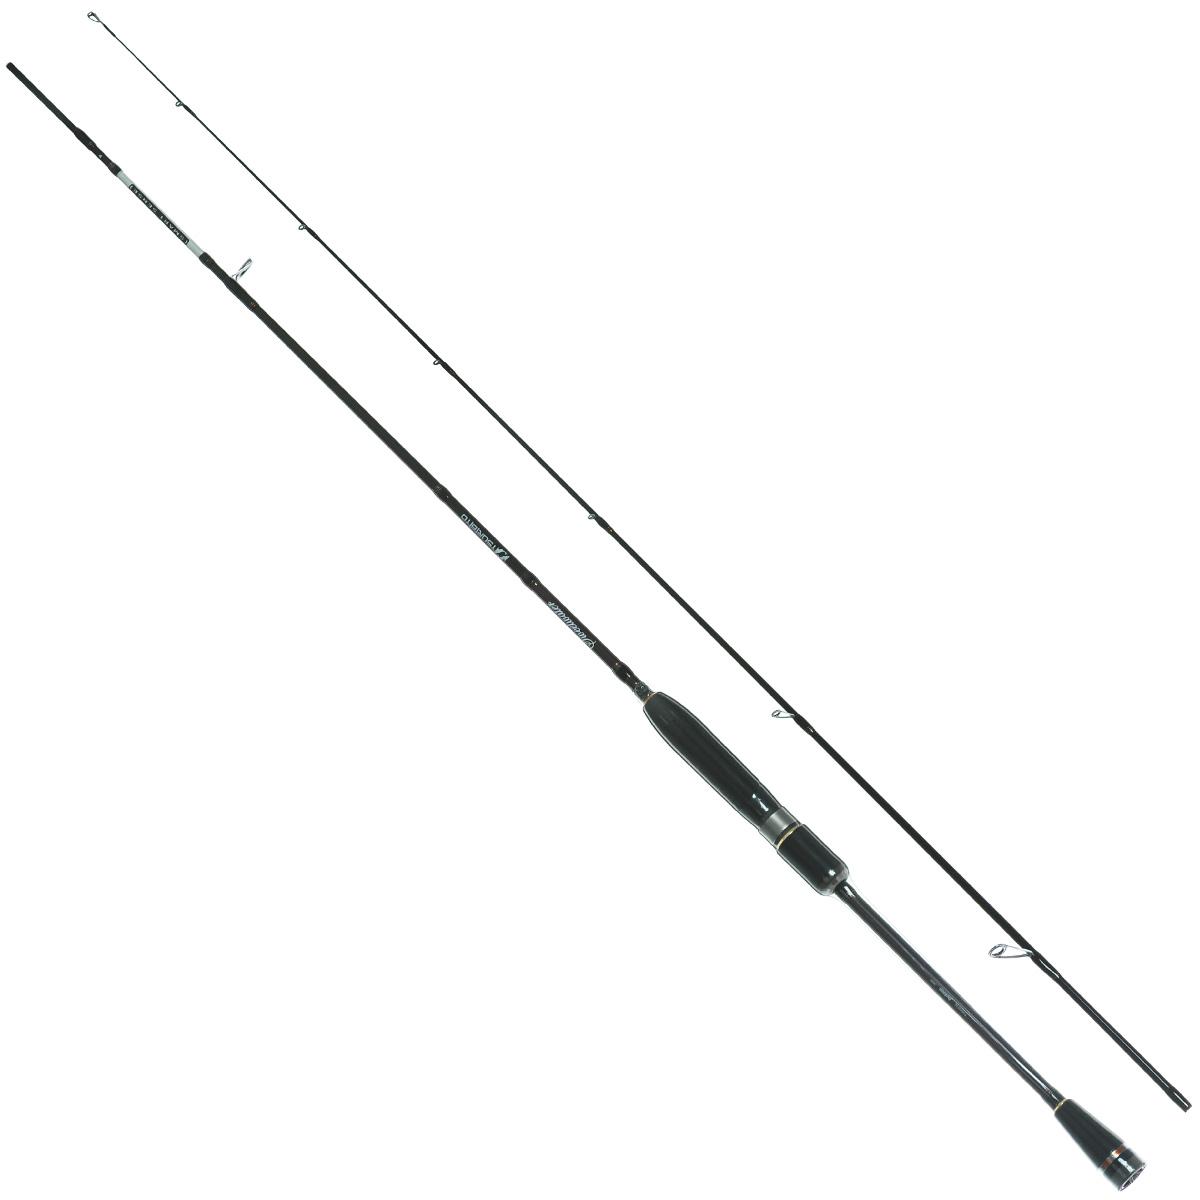 Удилище спиннинговое Tsuribito-Jackson Sweetwater, 1,91 м, 4-15 г